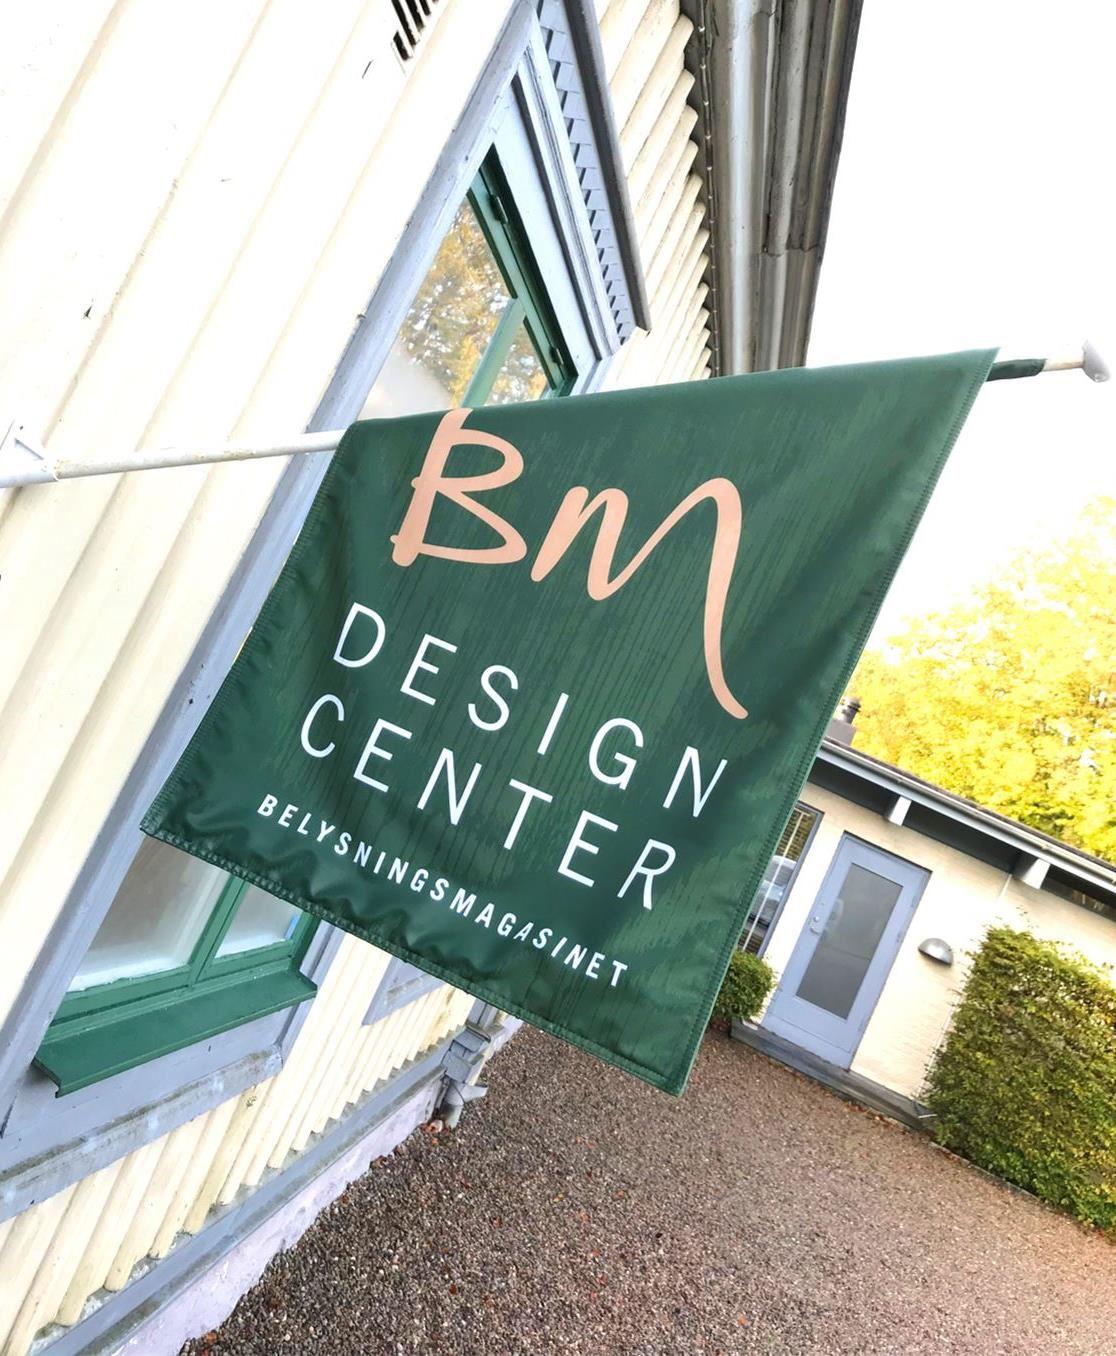 BM Design Center in Svängsta